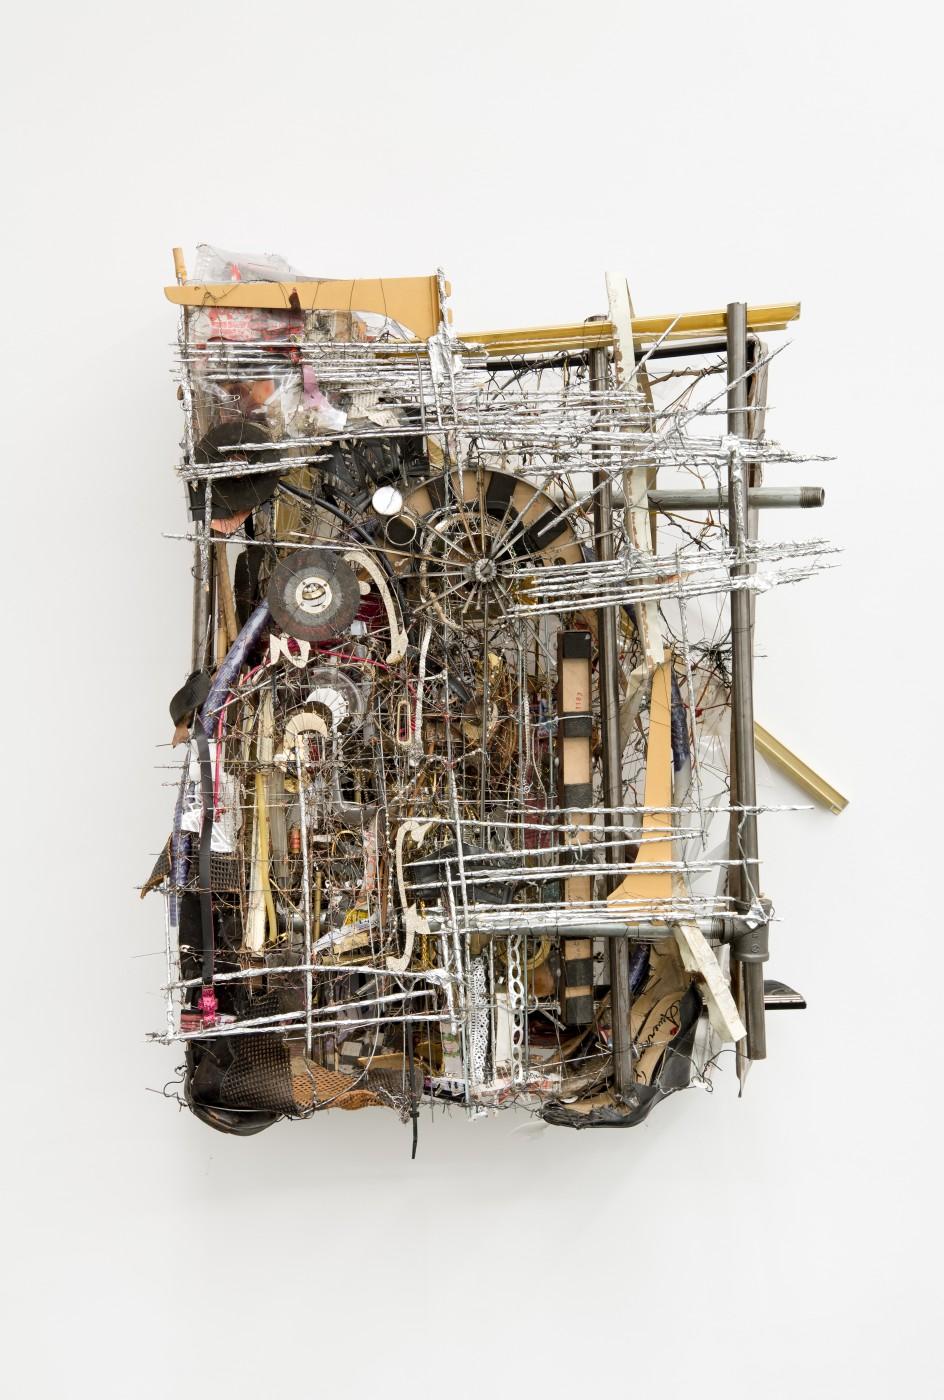 METROPOLITAN  Rosarie Metropolitan</I>, 2015 Mixed media 91,5 x 75 x 35 cm / 36 x 29.5 x 13.7 in - High Art Gallery Paris